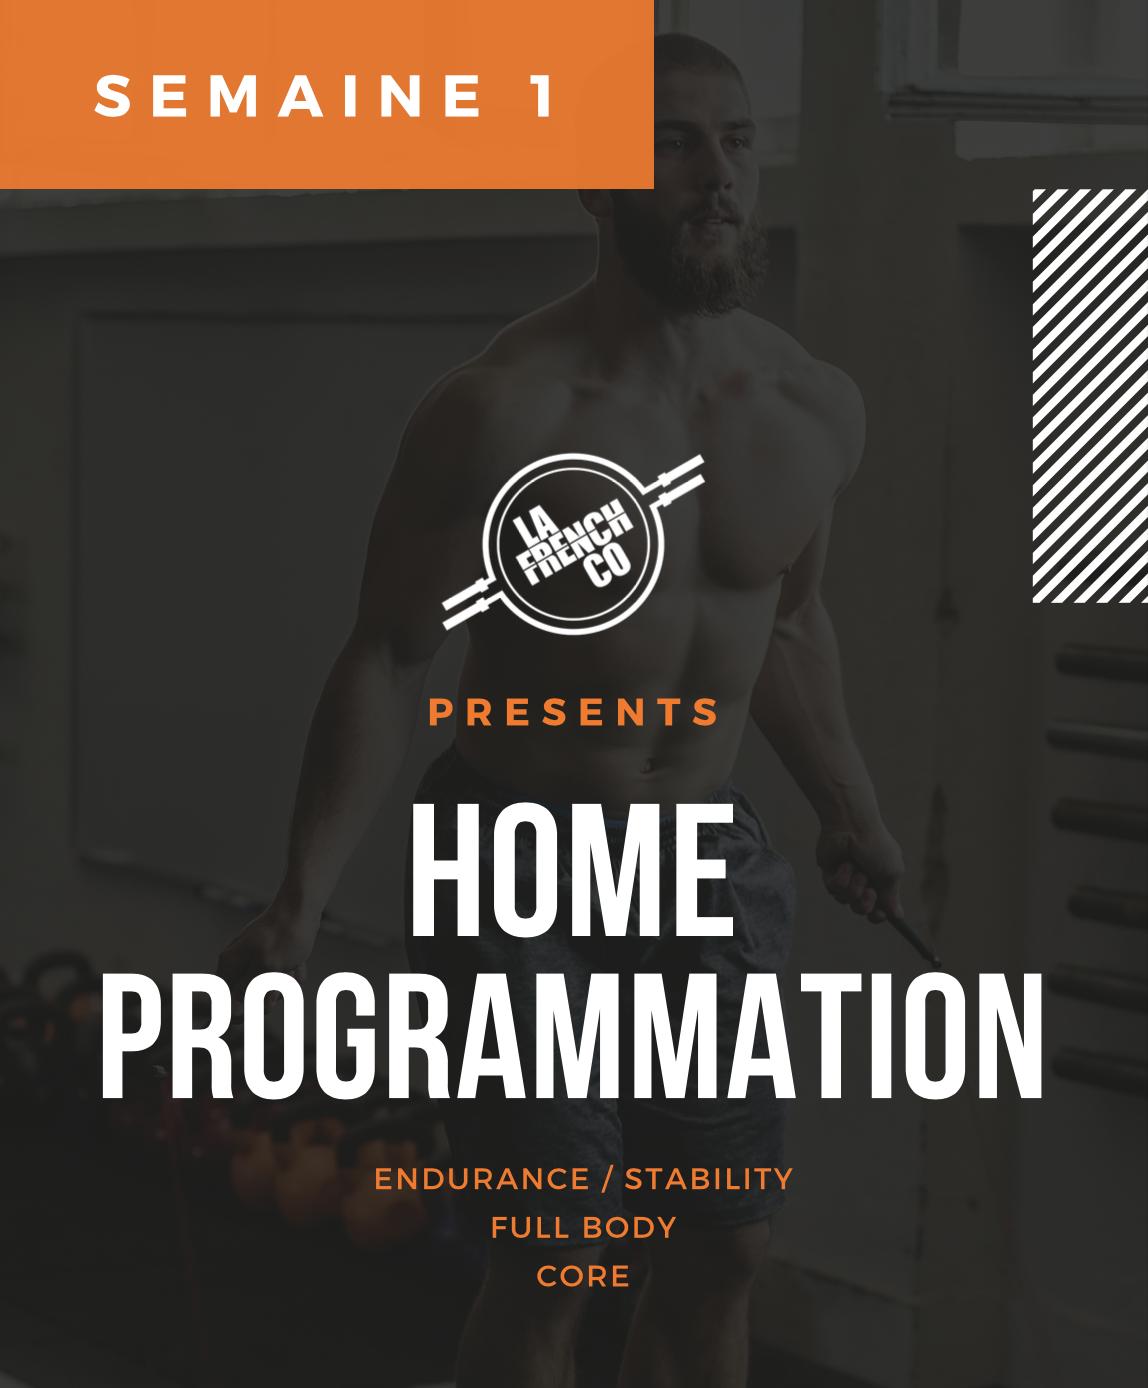 Home Prog, Cycle 4, semaine 1